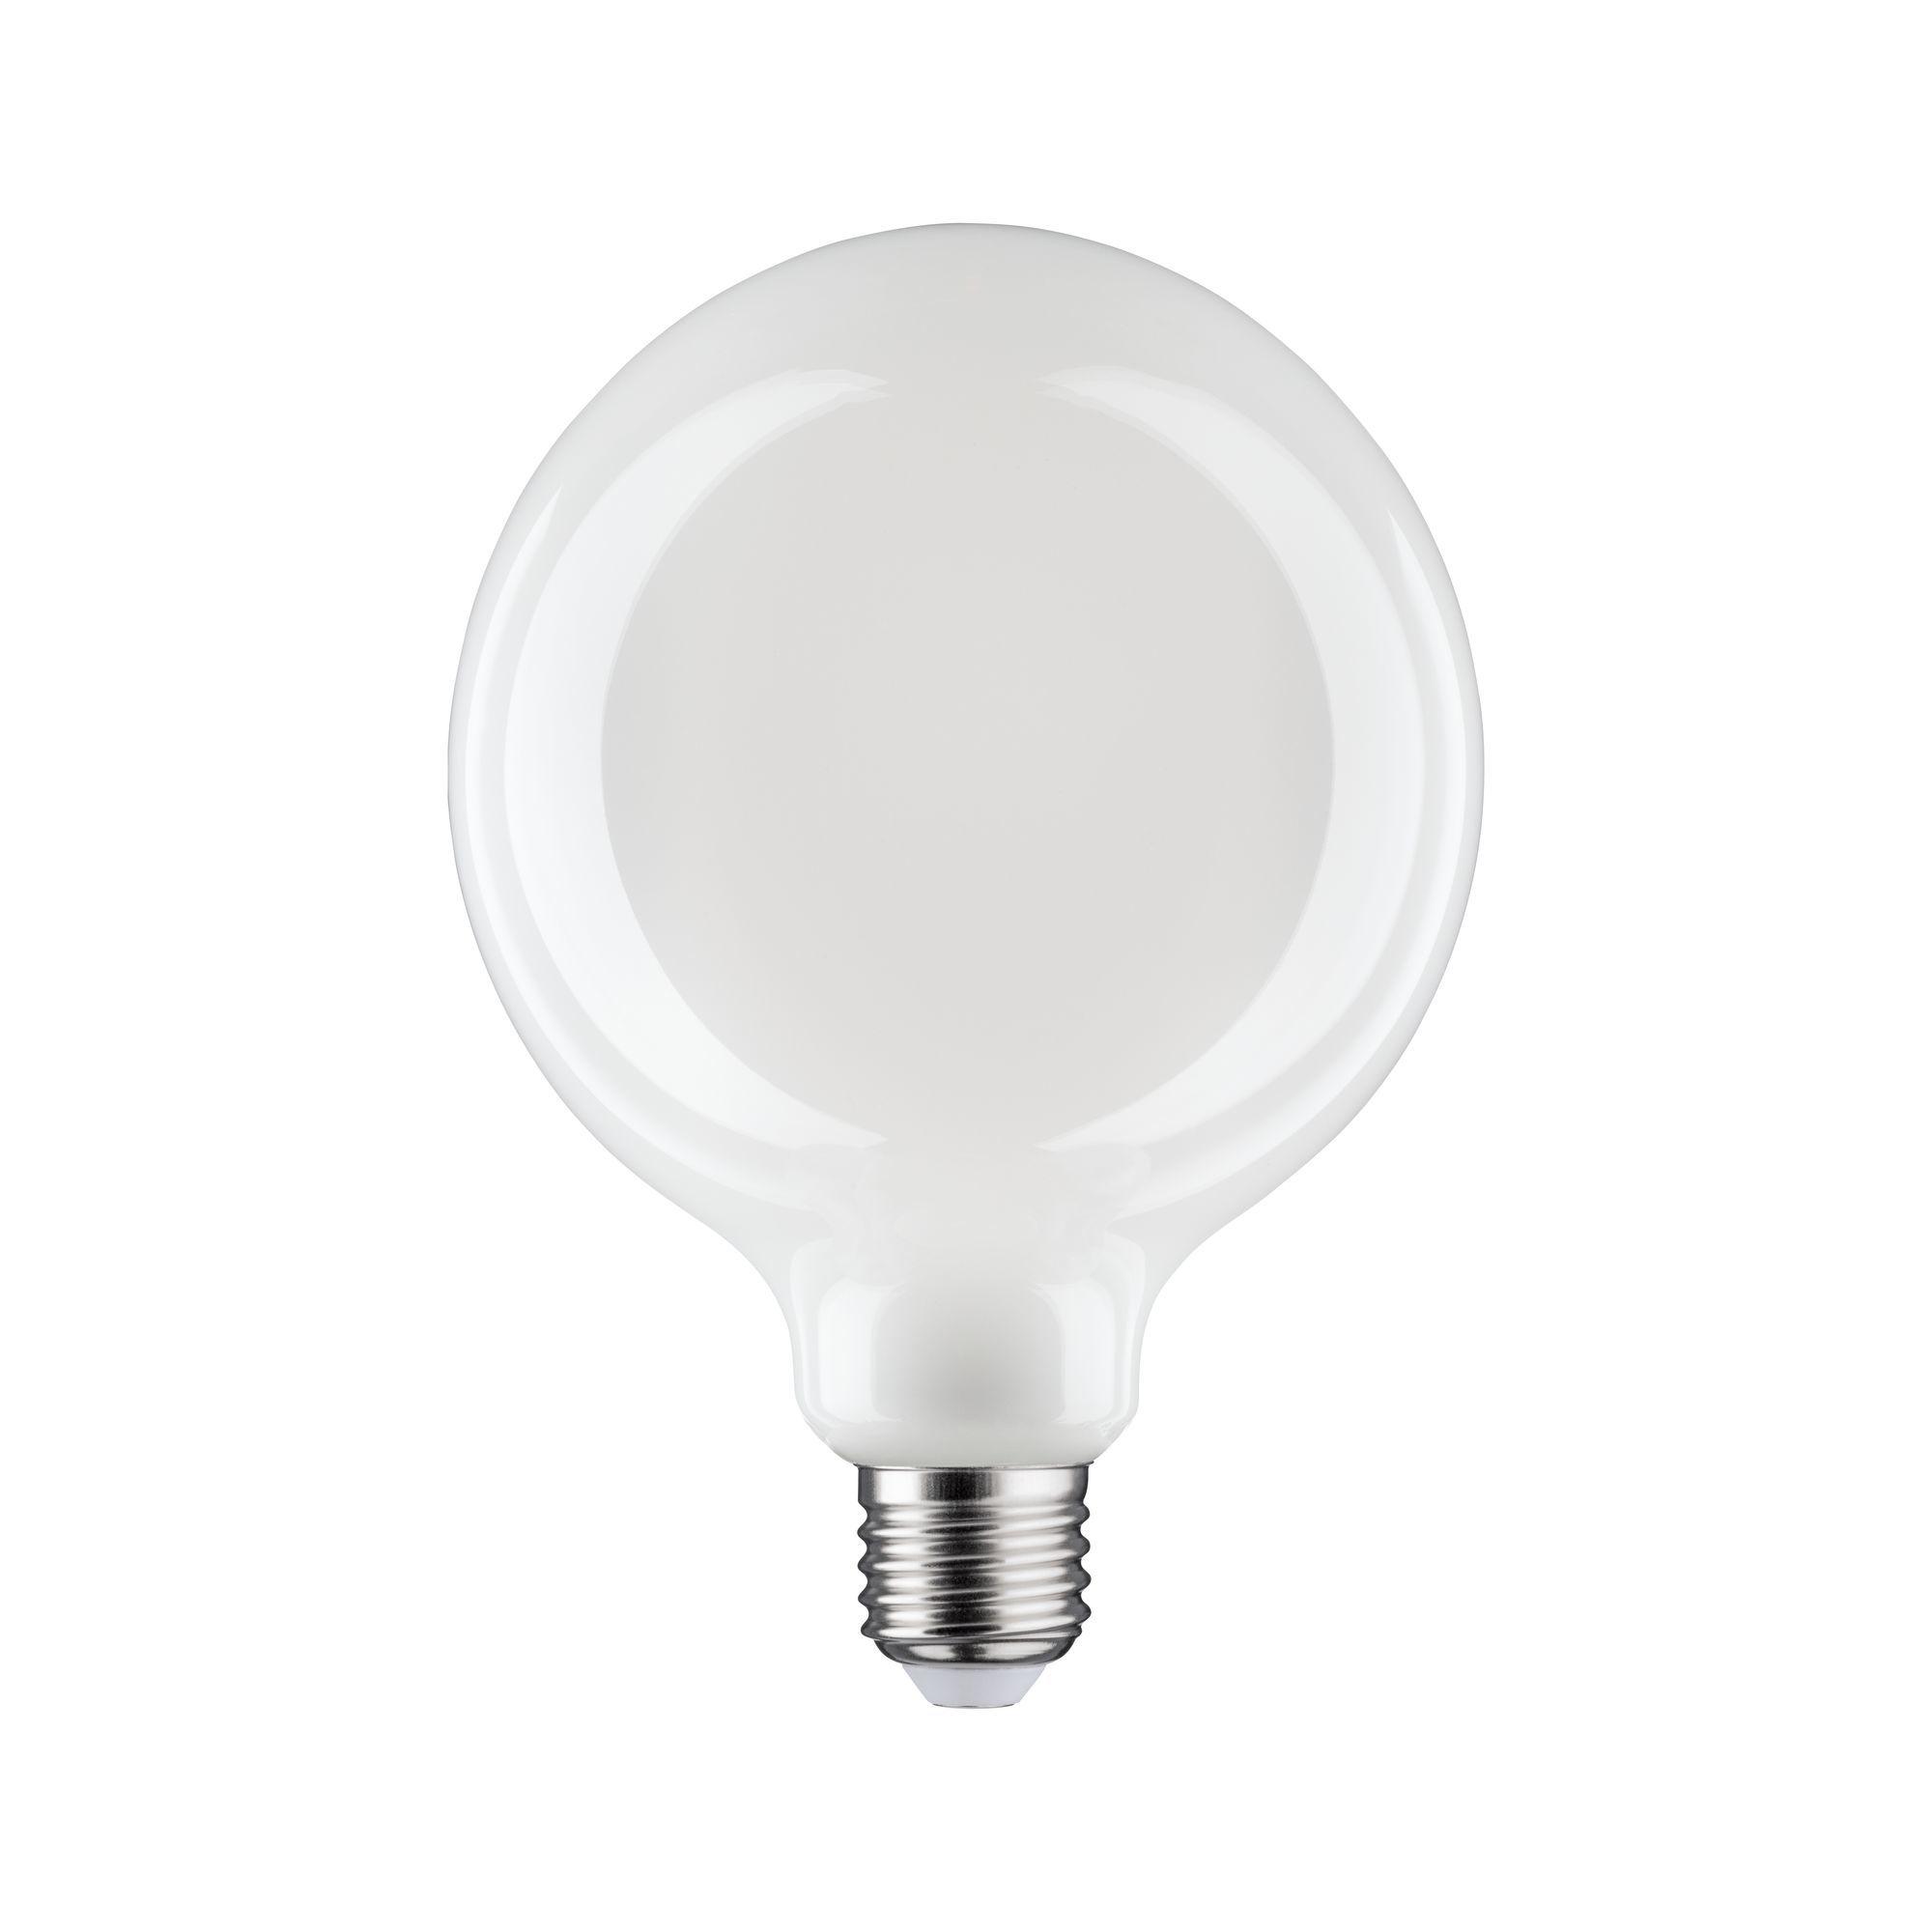 Paulmann LED Fil G125 470lm E27 2700K opal dim 6W 230V (28626)